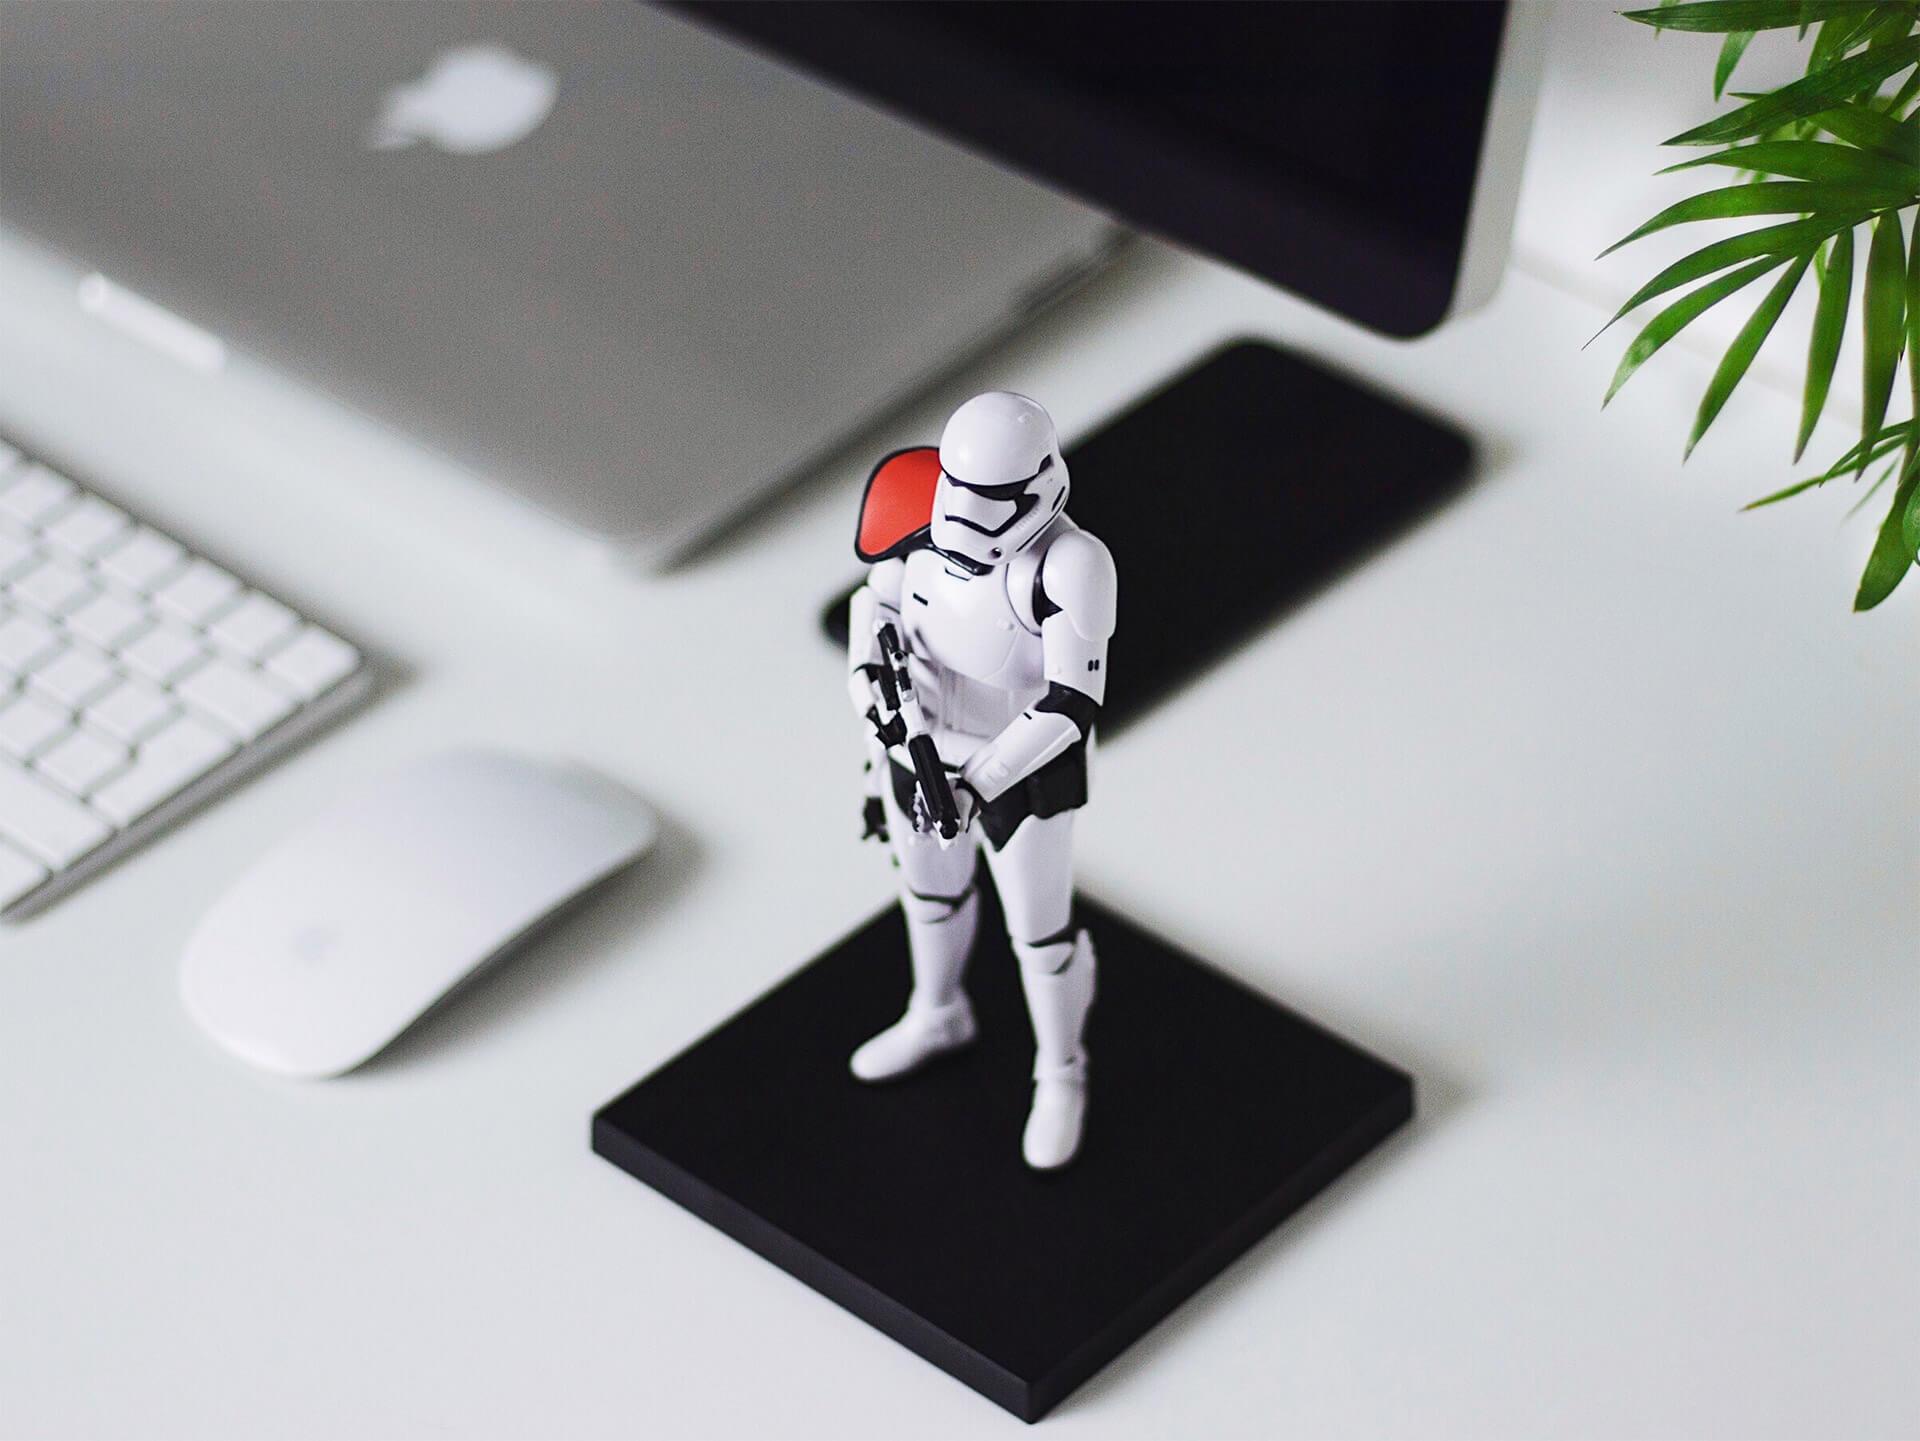 Star Wars Stormtropper figurine on table